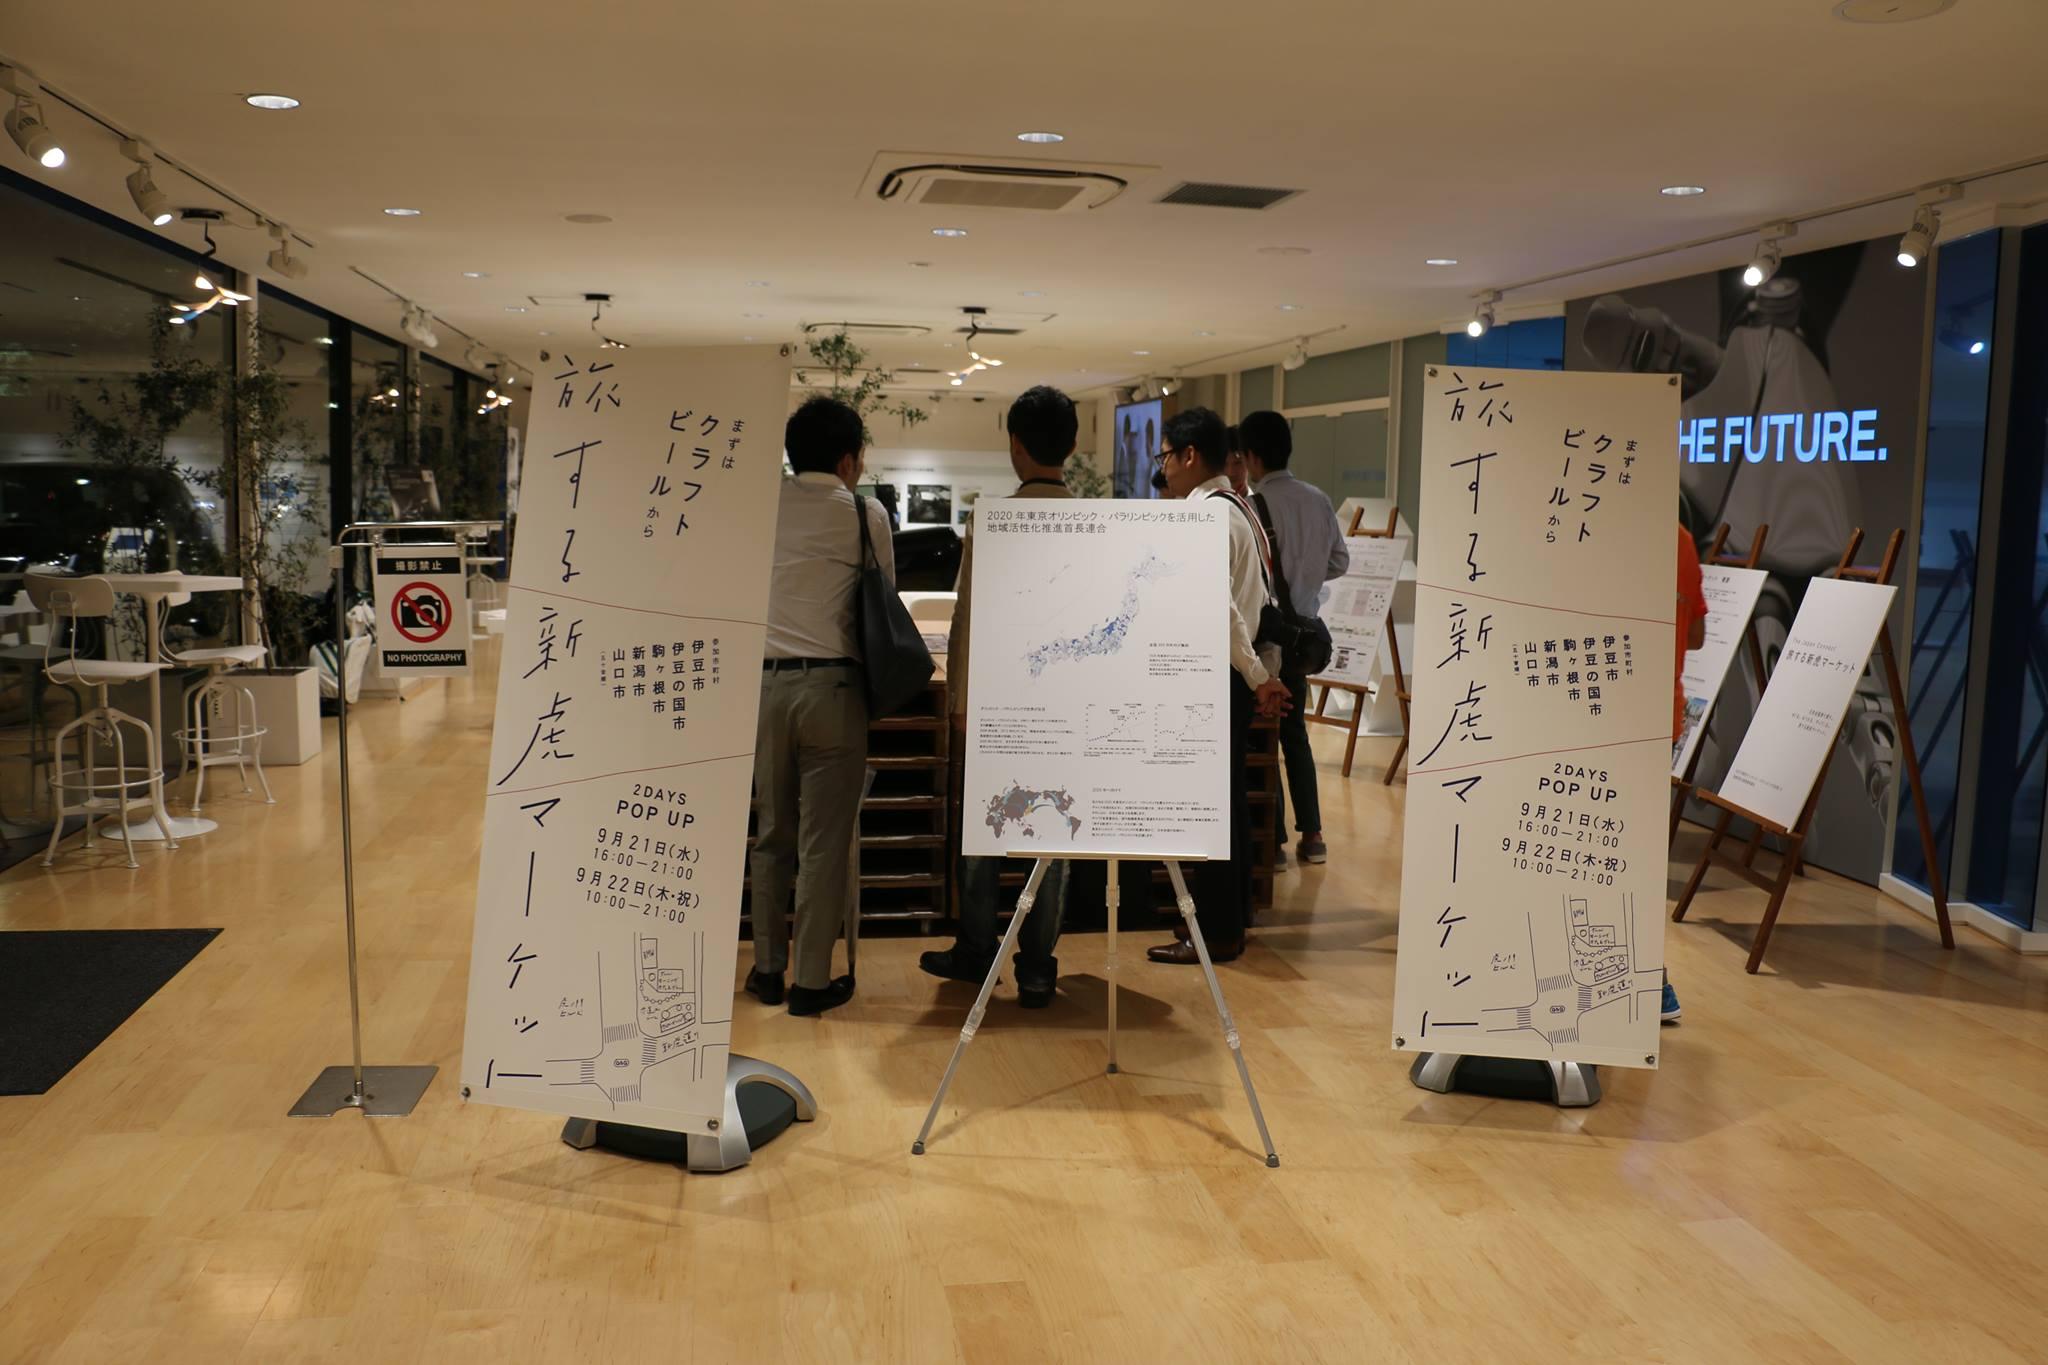 BMWショールーム内では模型の展示も実施。(撮影はNG)